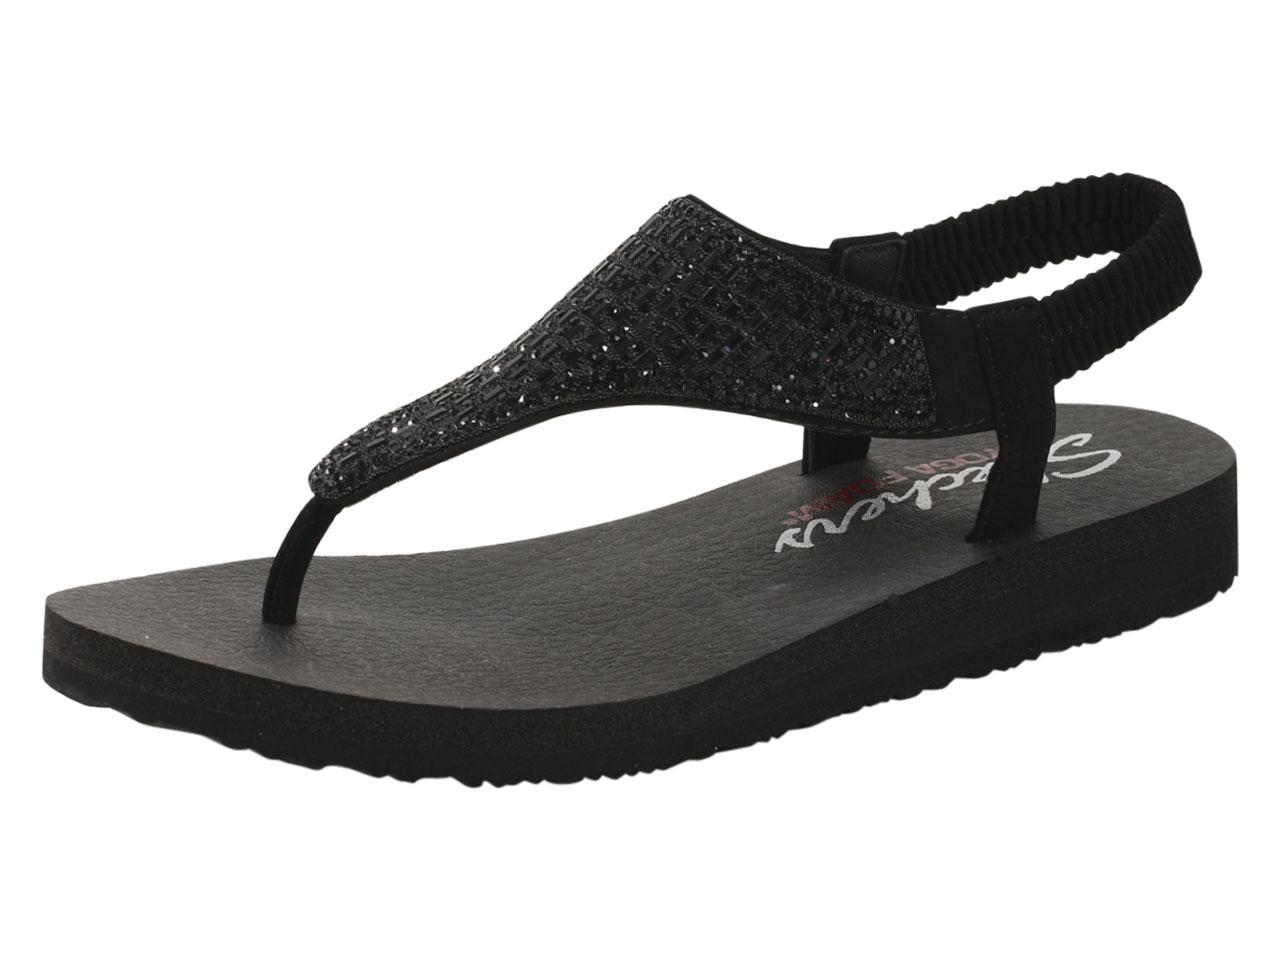 7142b2f777b Skechers Women s Meditation Rock Crown Yoga Foam Sandals Shoes